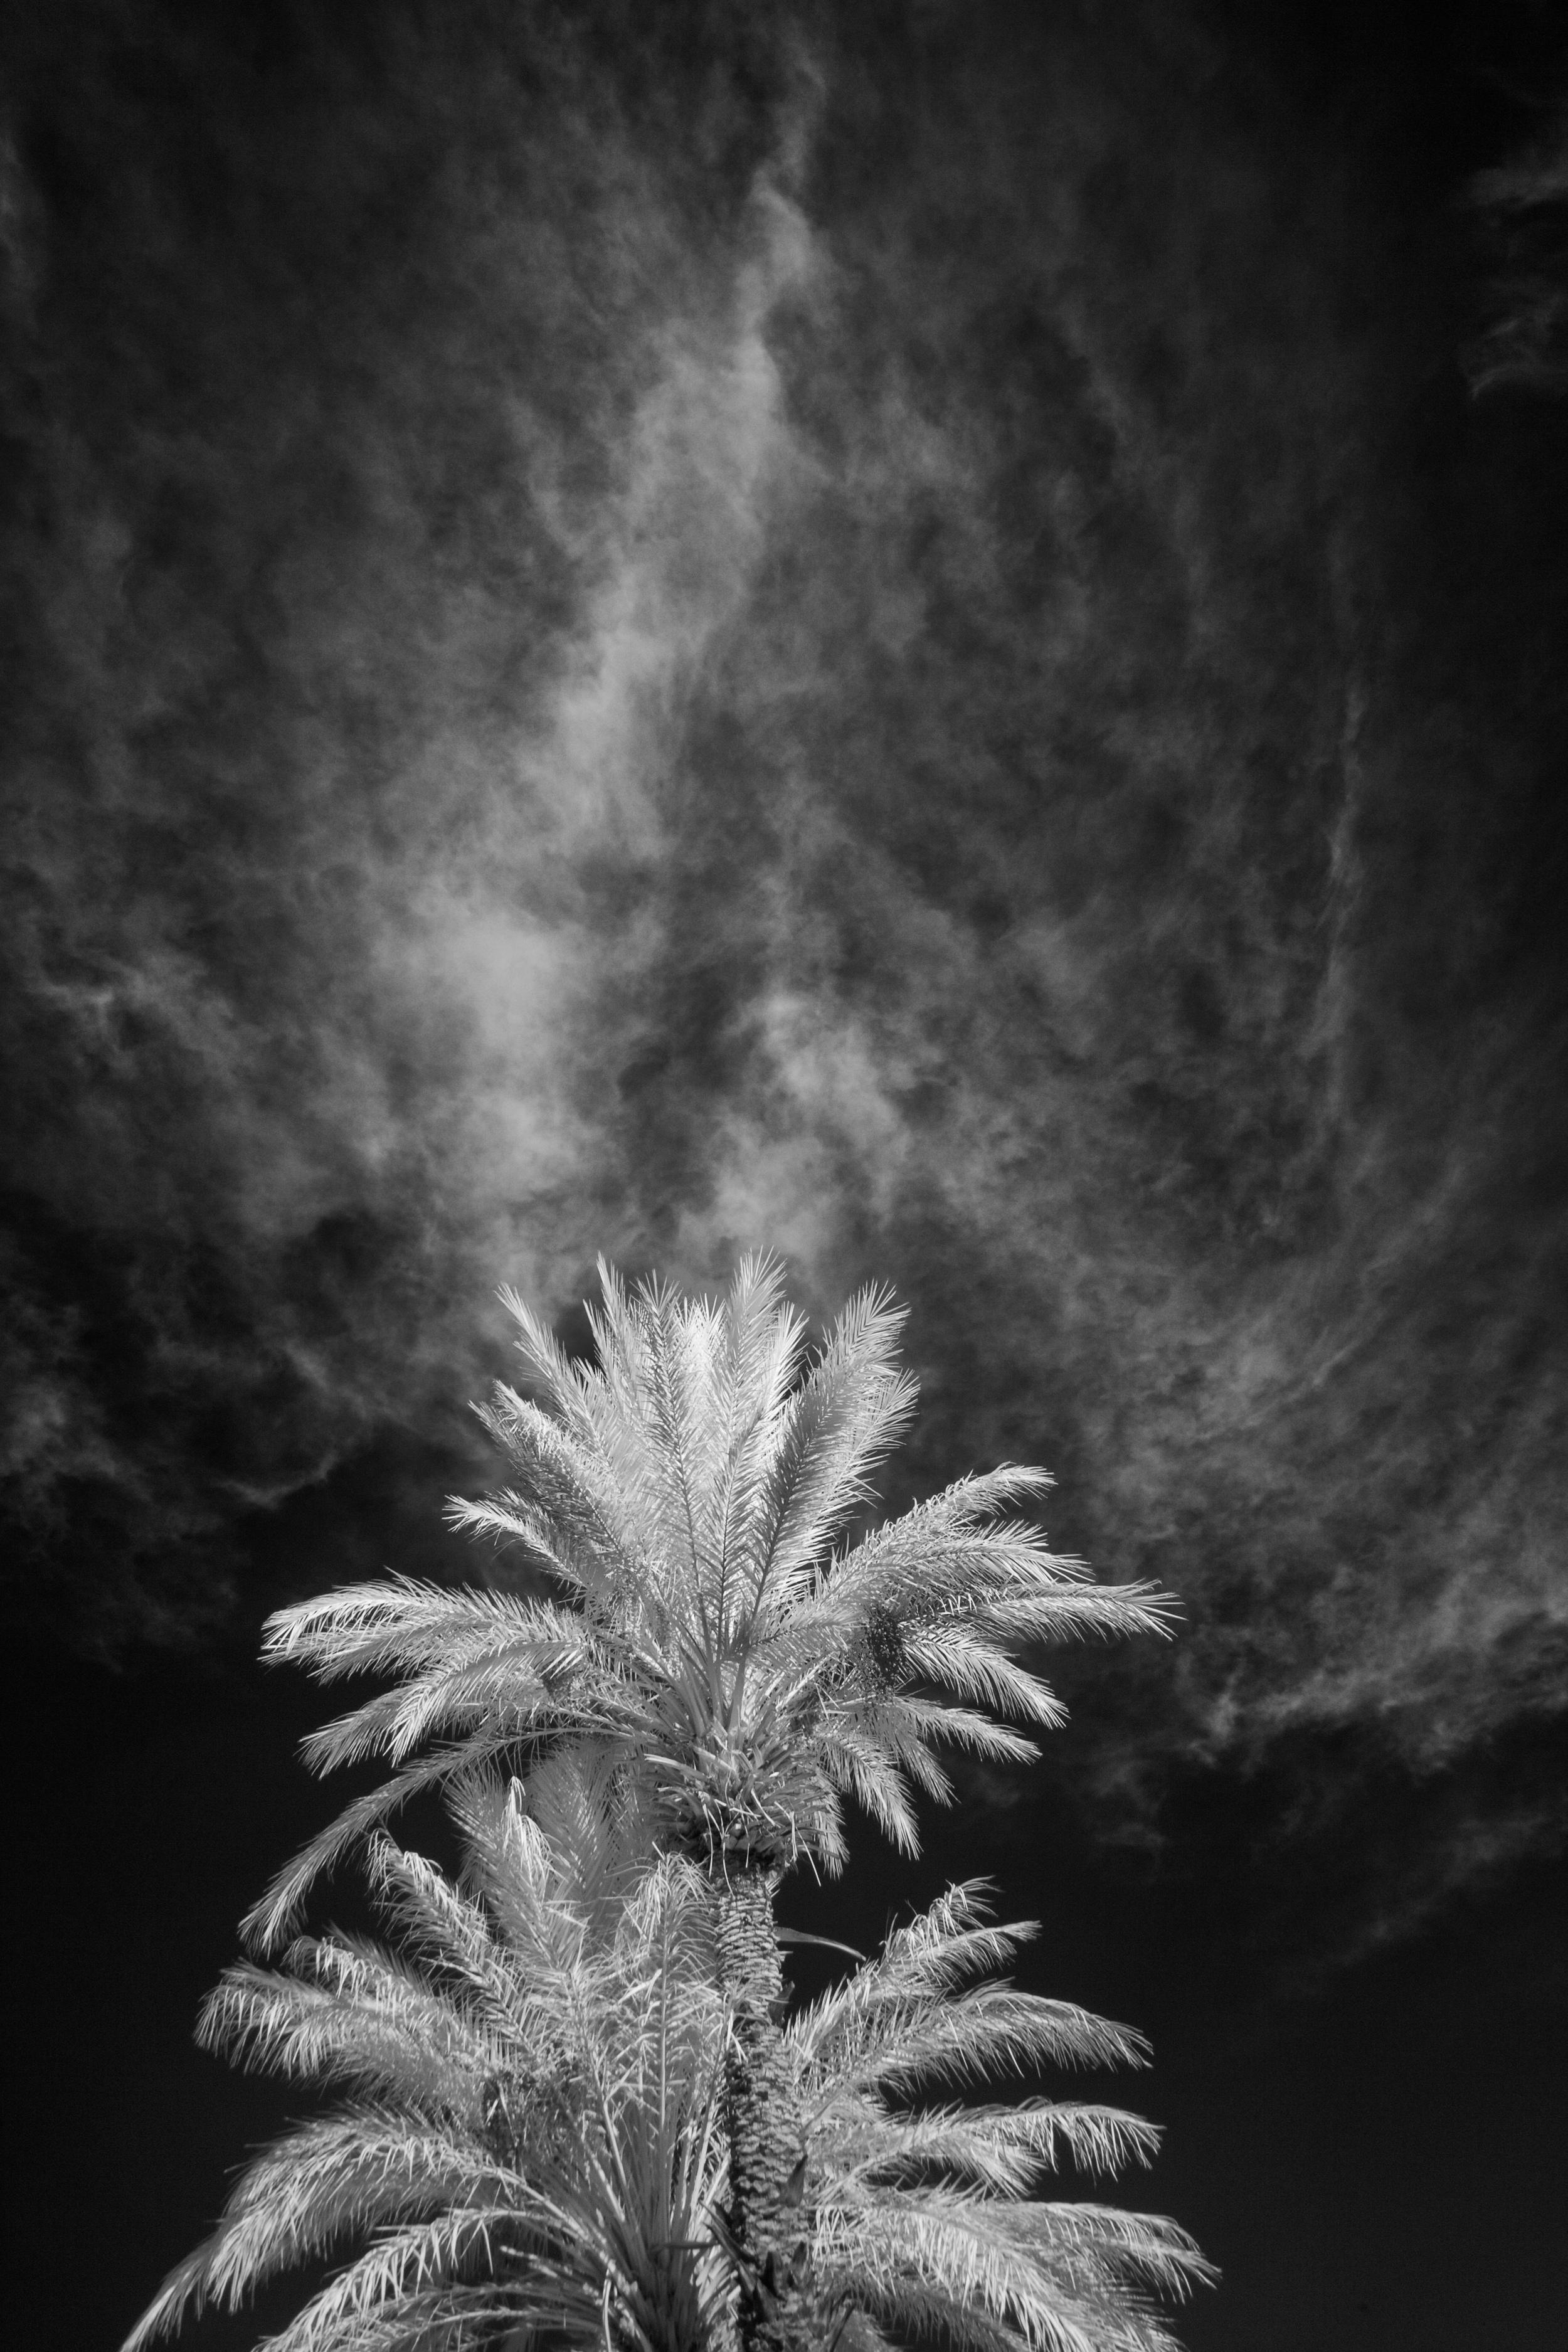 © Ron Rosenstock Photography